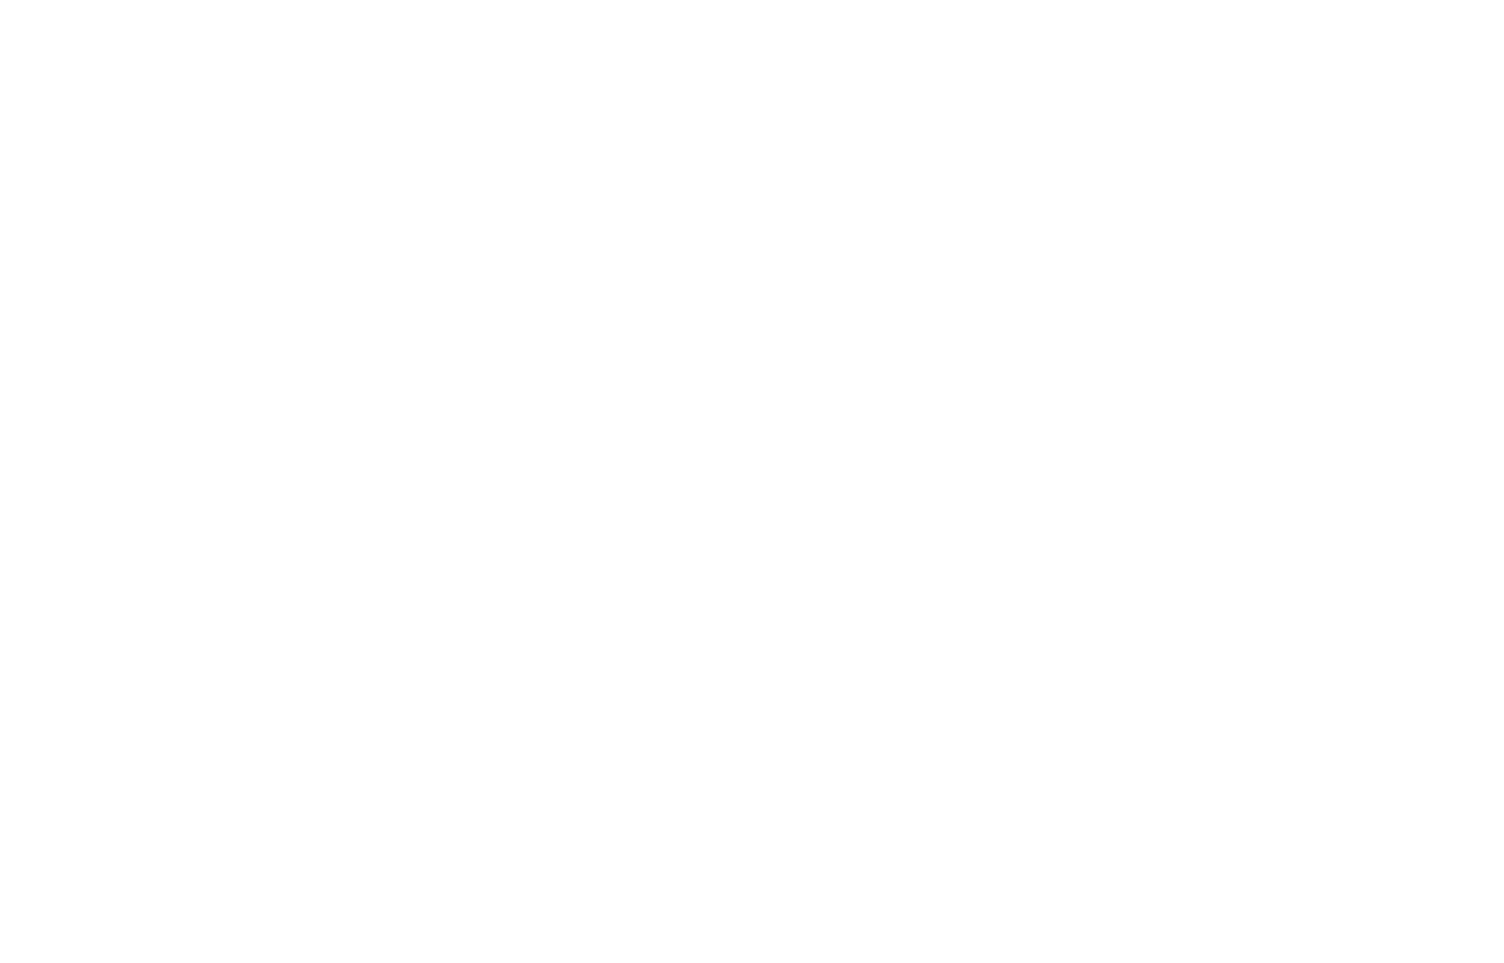 Gämmerler Weltkarte Gelting Geretsried